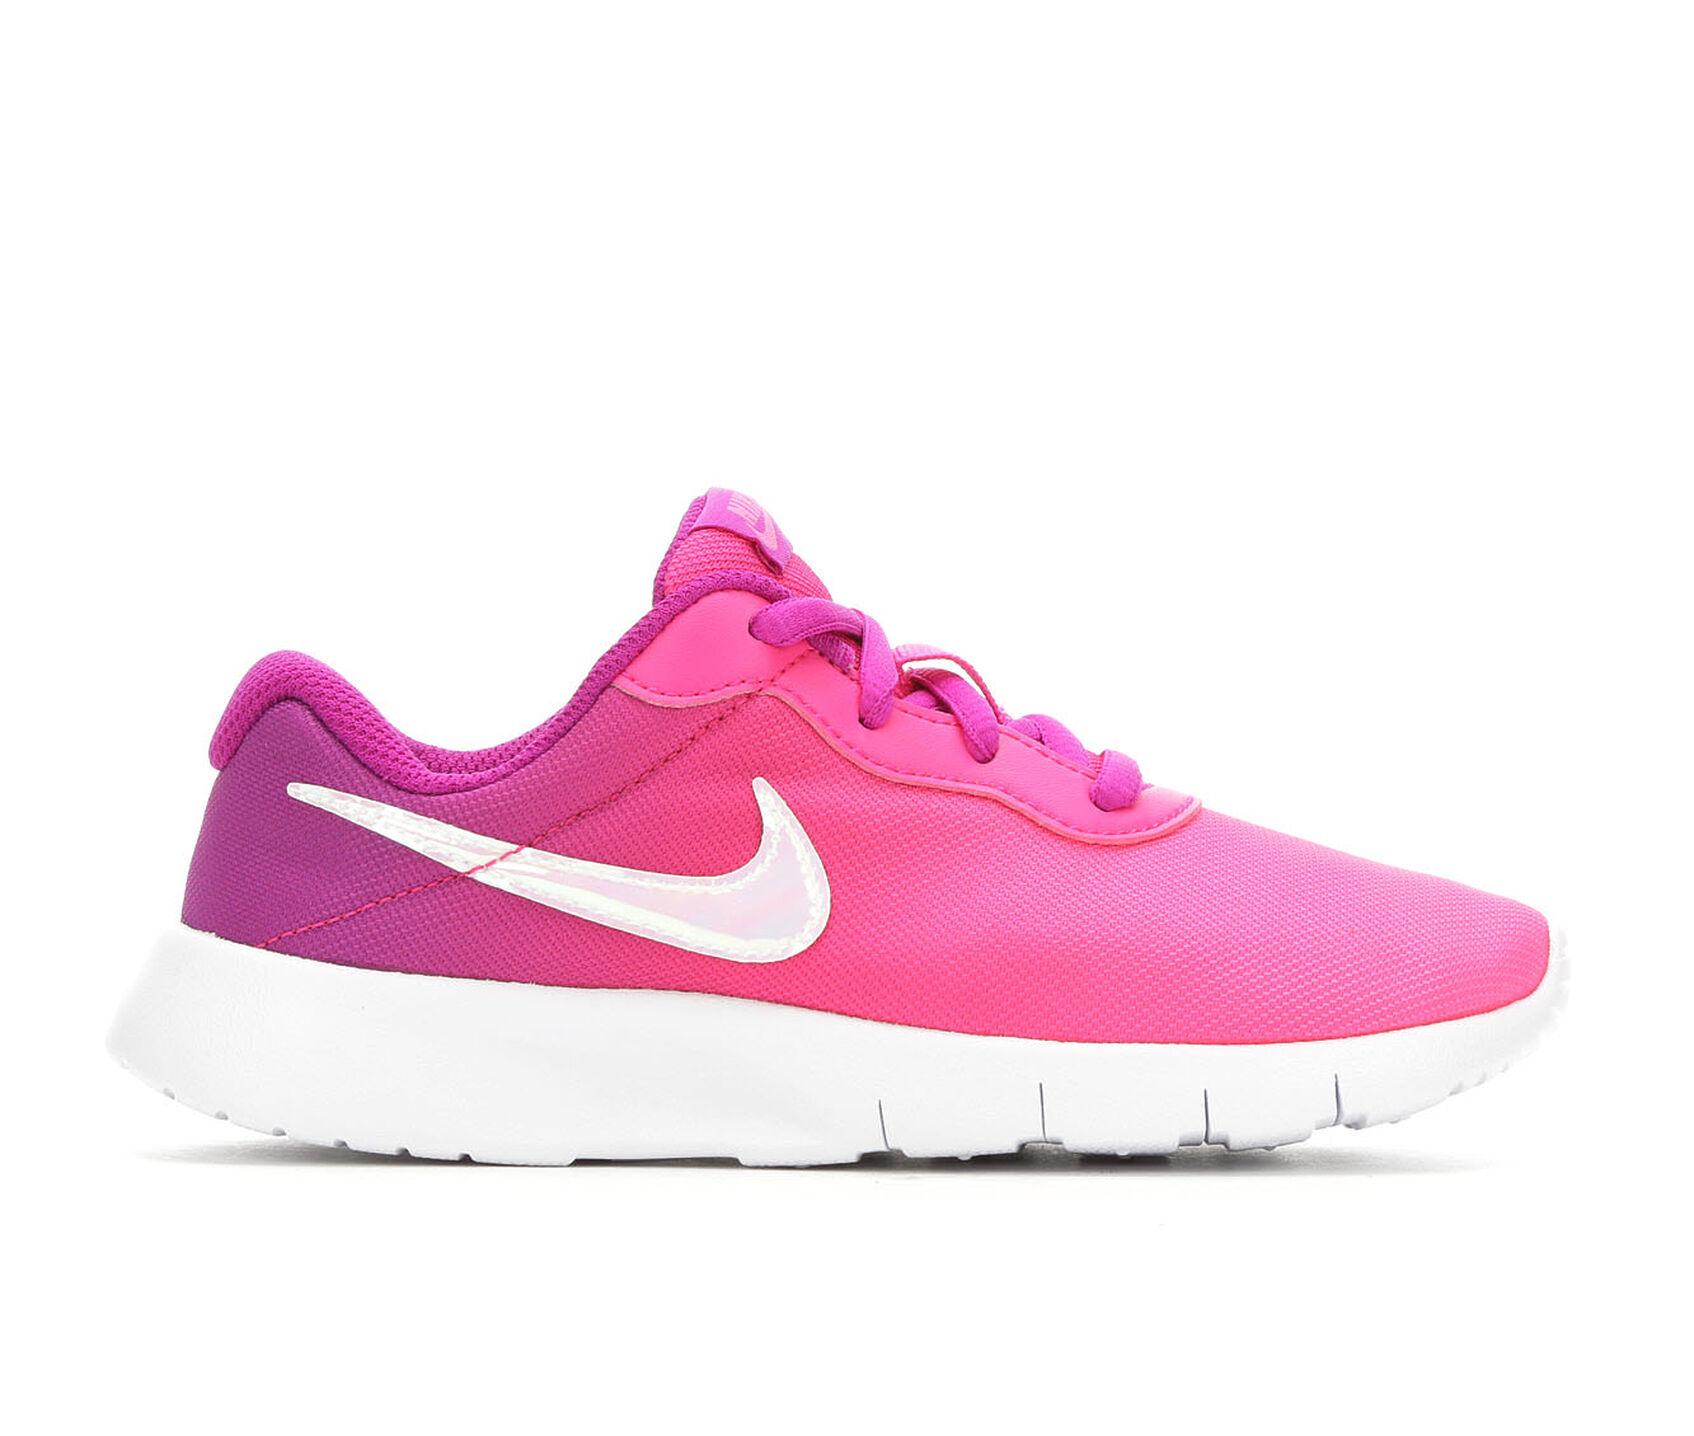 313aa87d7cbe Girls  Nike Little Kid Tanjun Fade Running Shoes